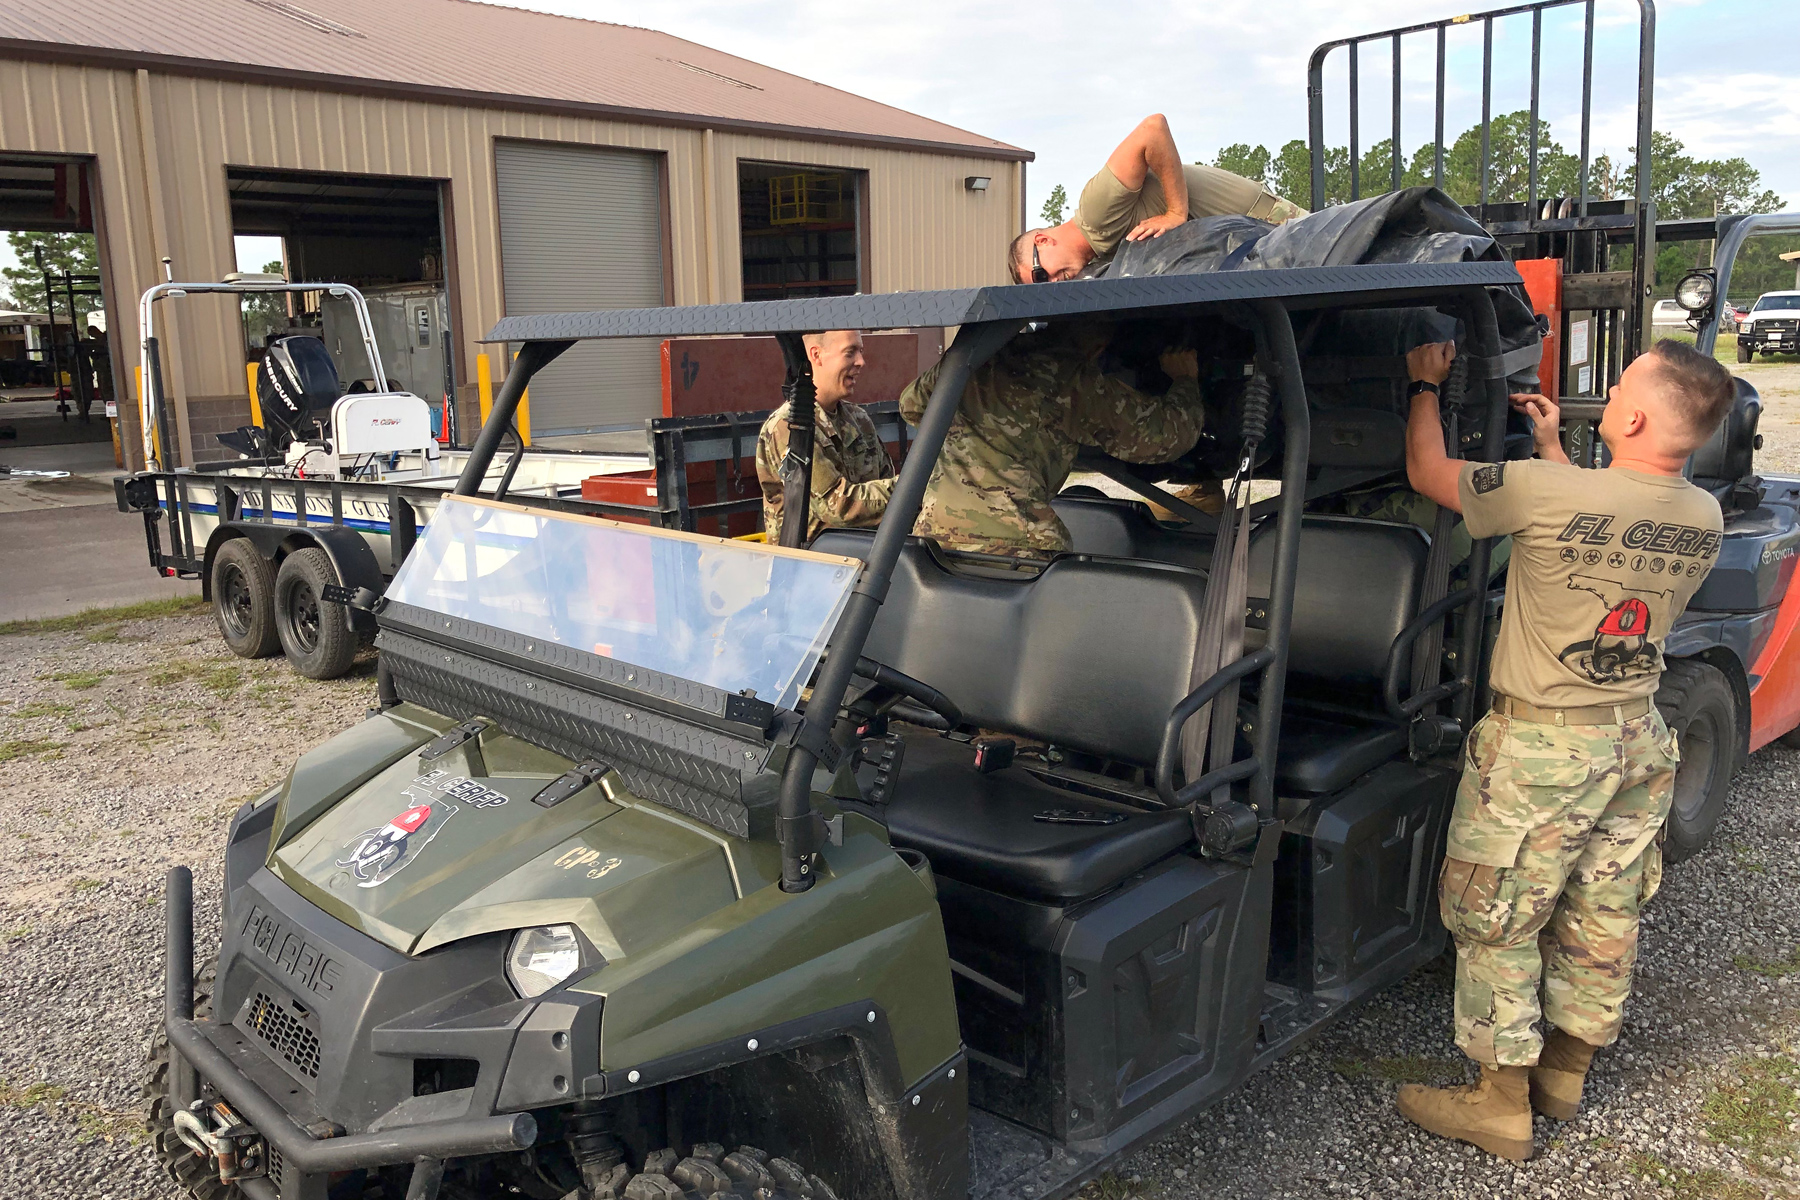 VA Clinics in Southern States Close Ahead Of Hurricane Dorian's Arrival